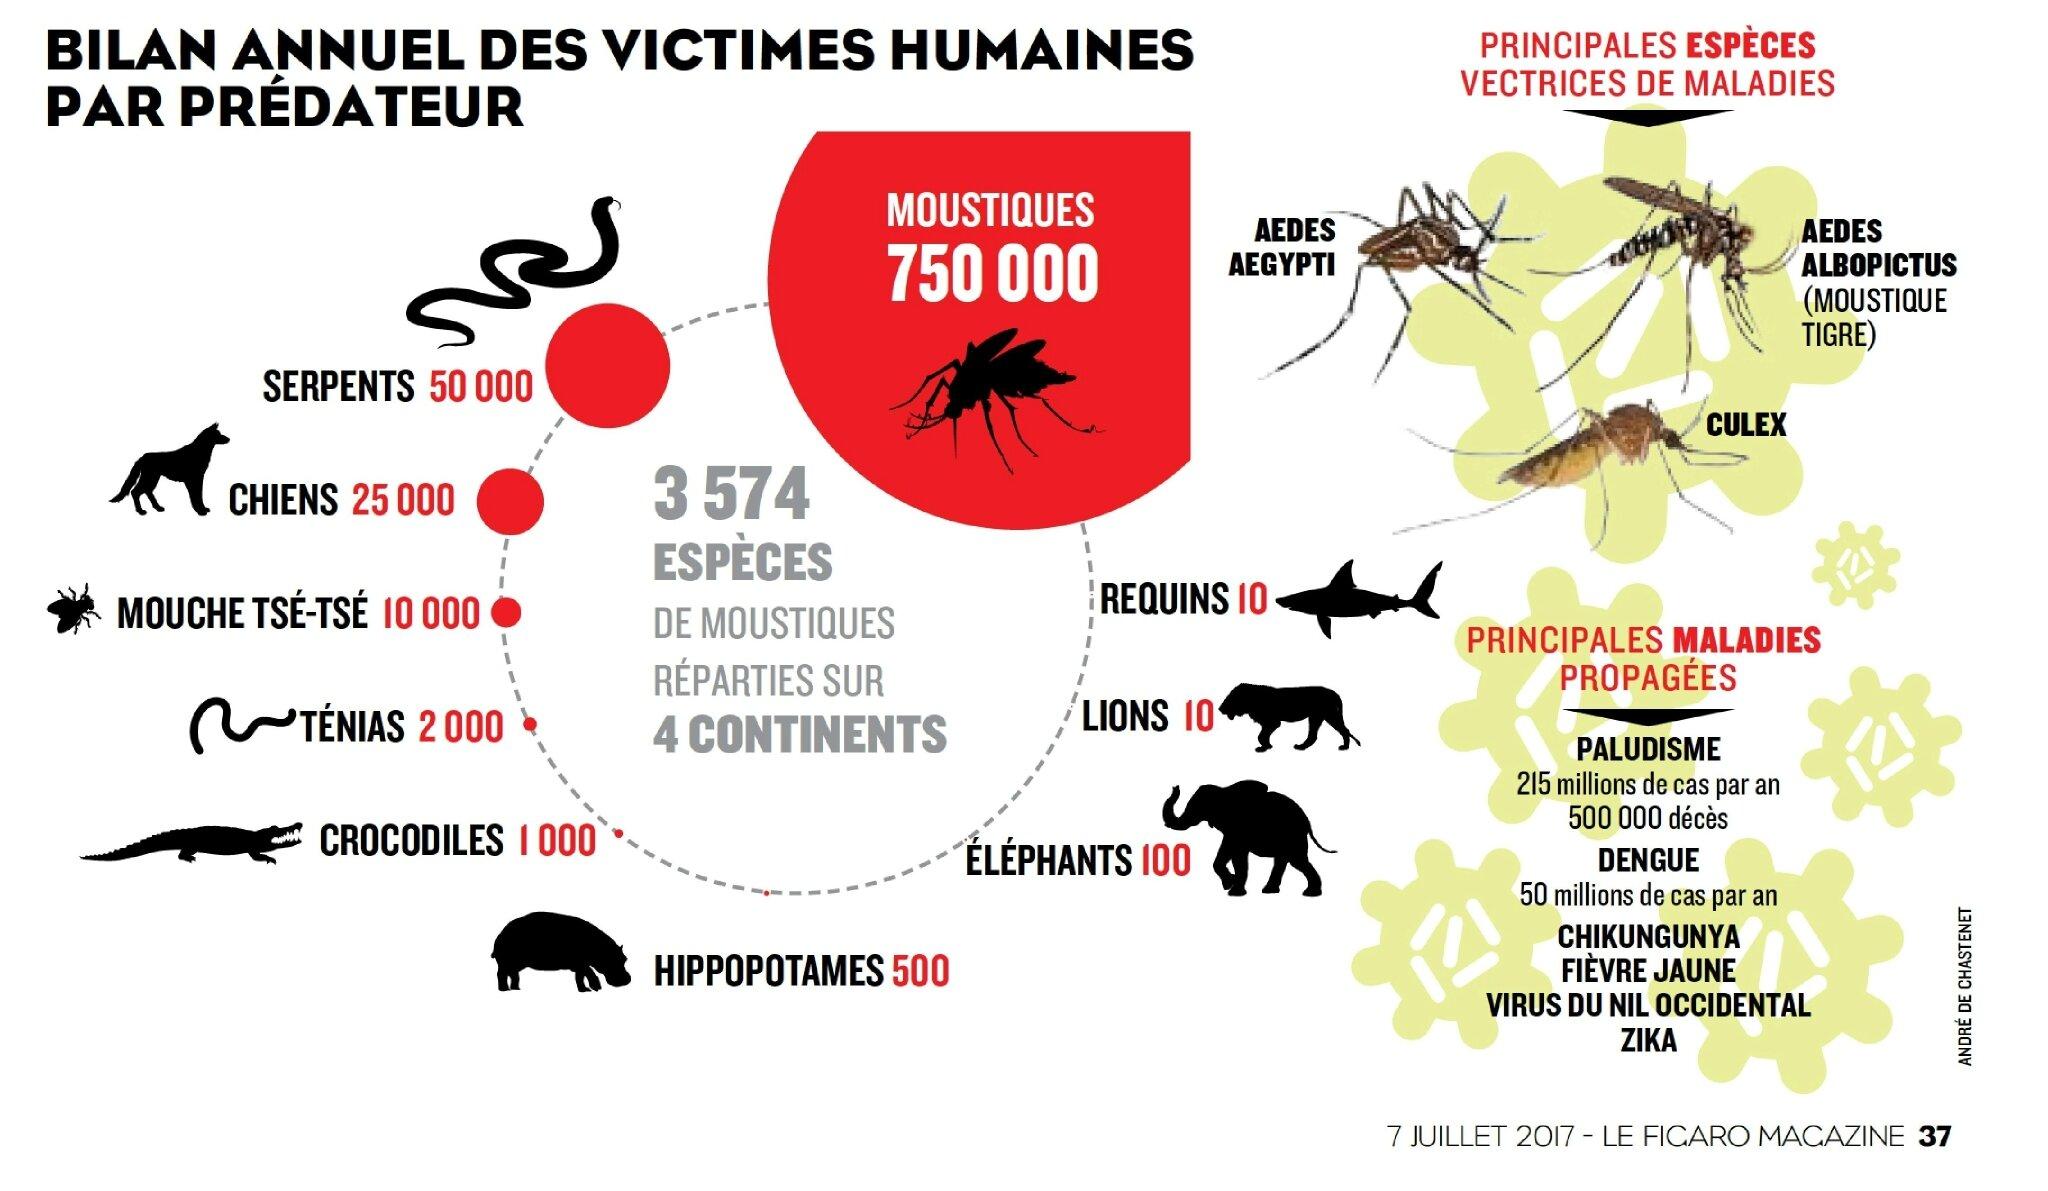 animaux tueur